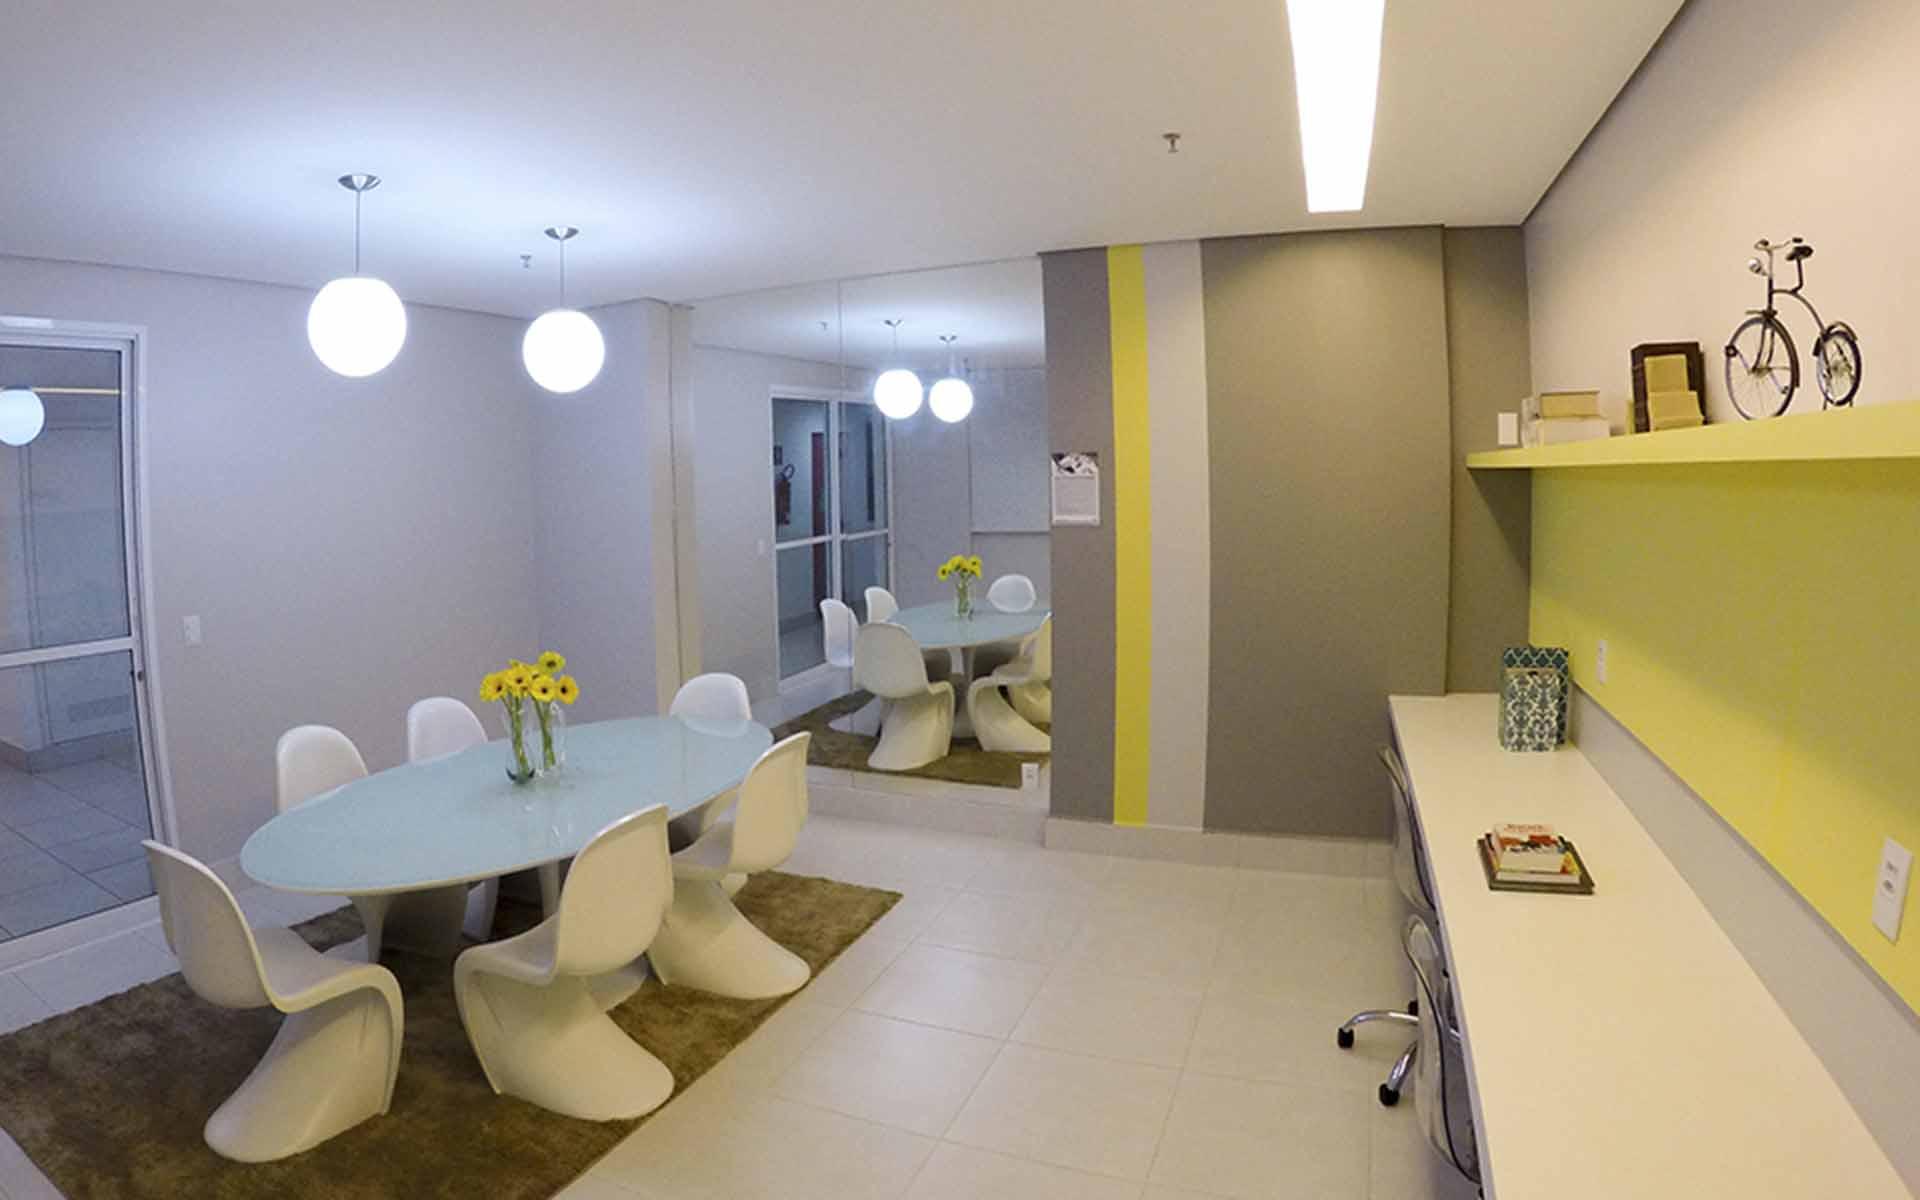 sala de estudos do apart hotel flat em brasilia spot hplus long stay